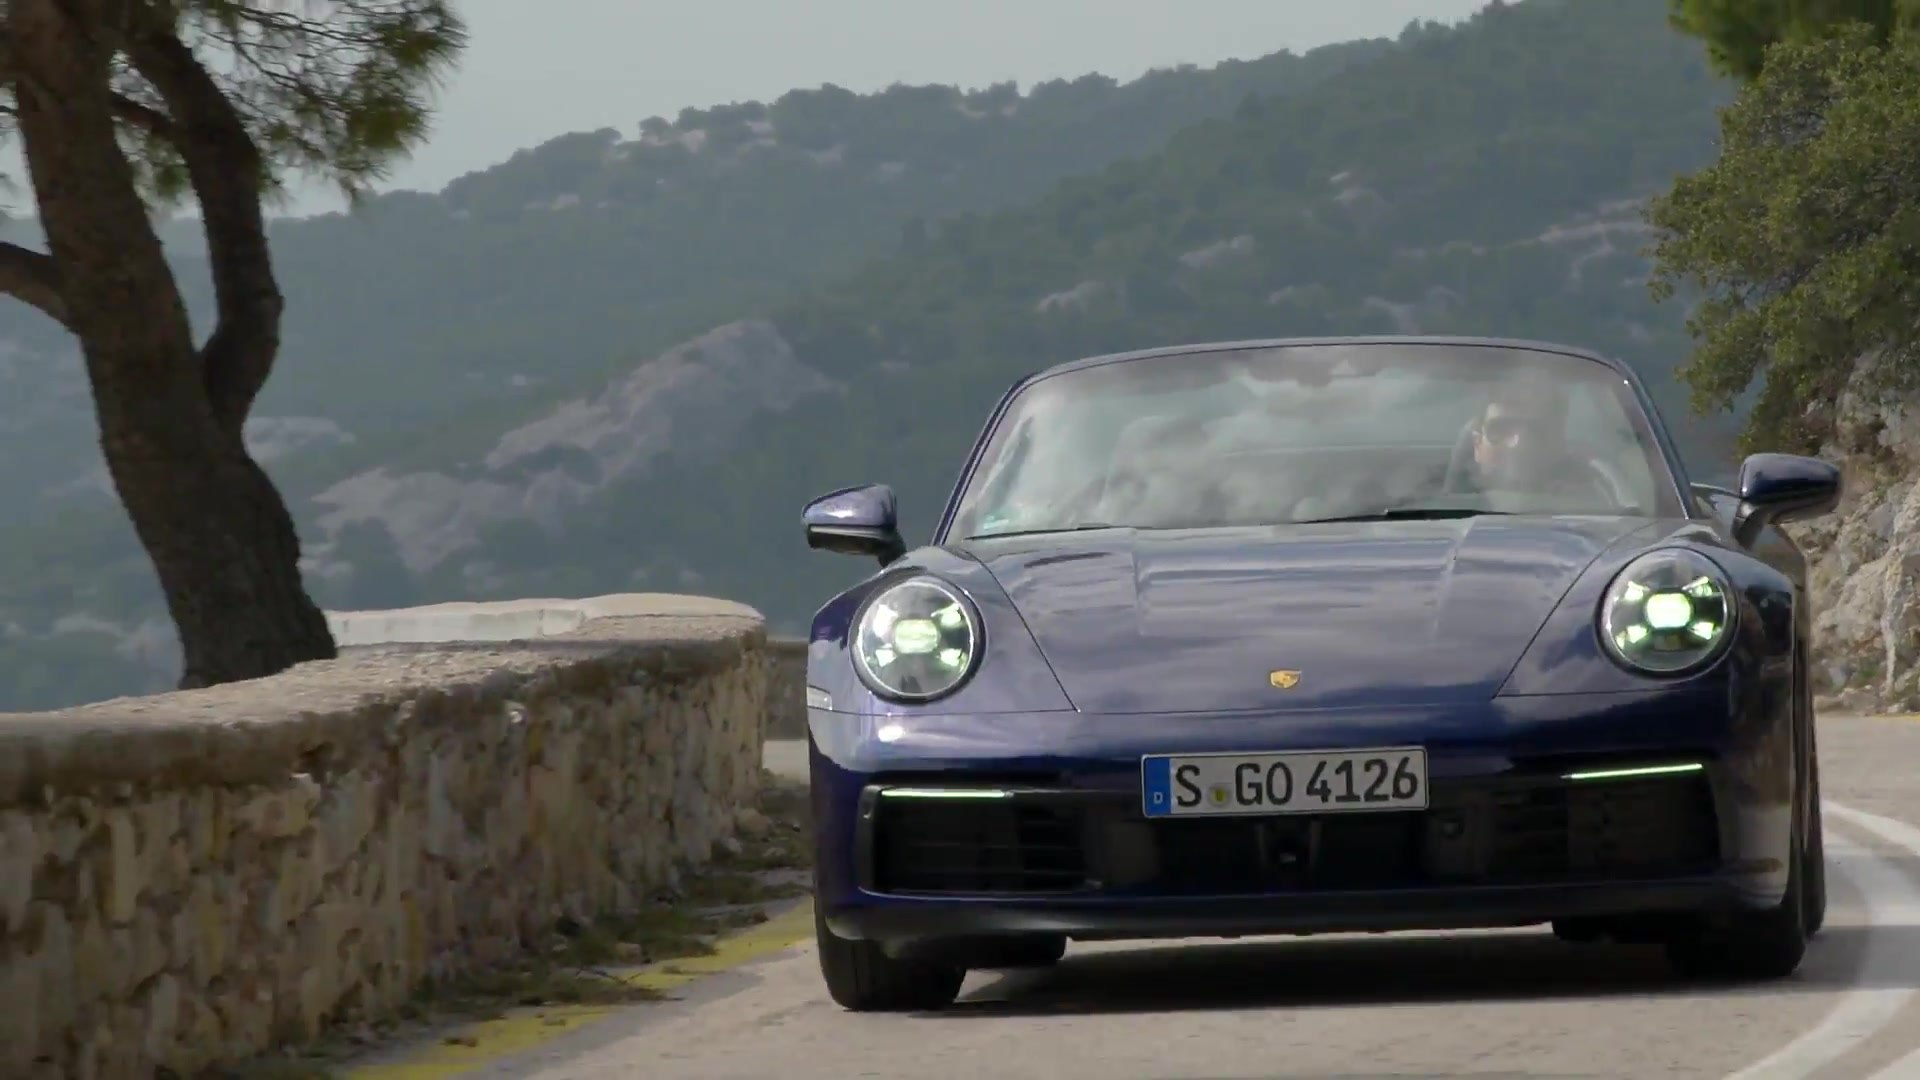 Porsche 911 Carrera 4s Cabriolet In Gentian Blue Metallic Driving Video Video Dailymotion